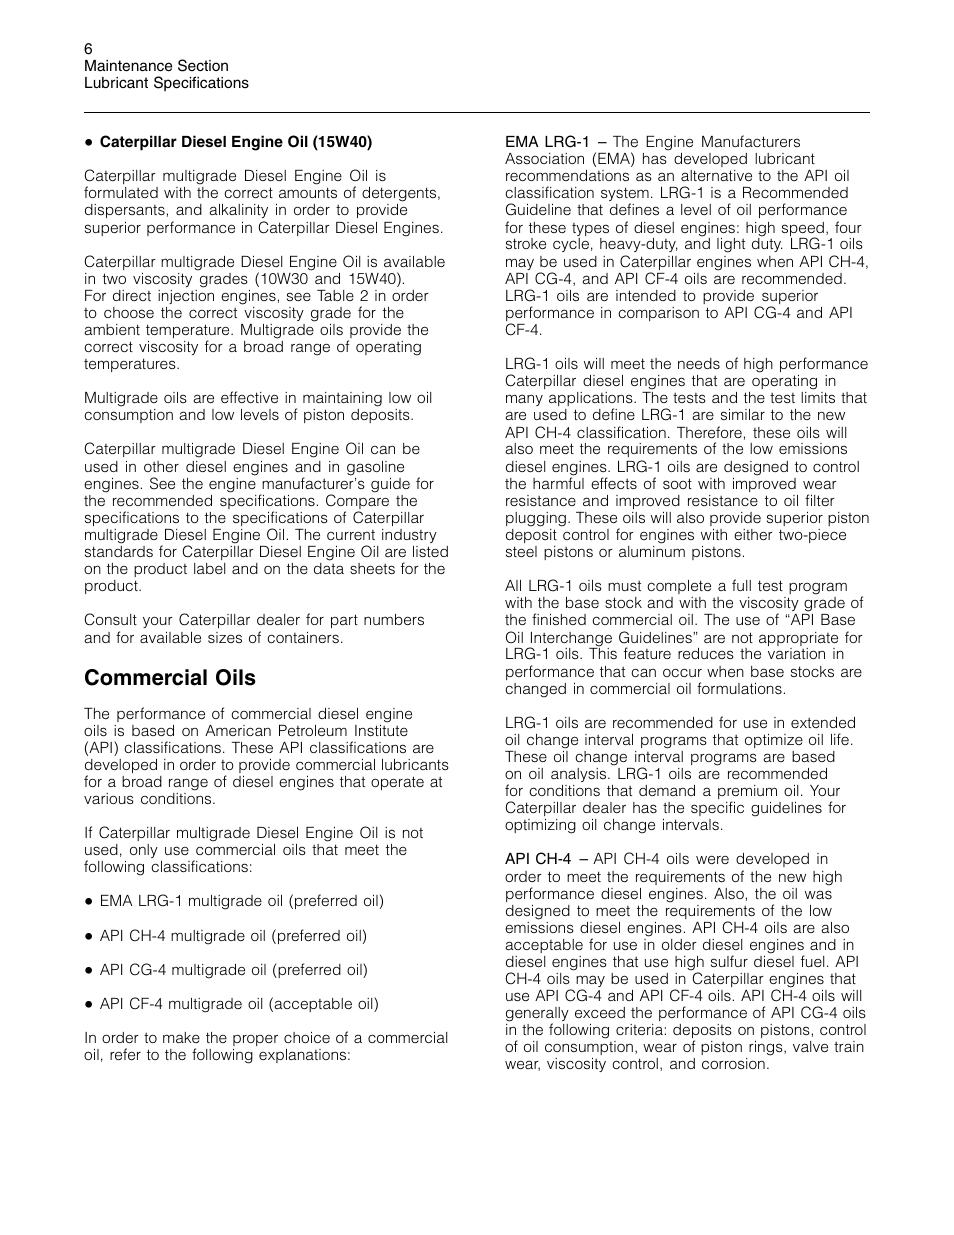 Commercial oils | 3Com Caterpillar Commercial Diesel Engine SEBU6251